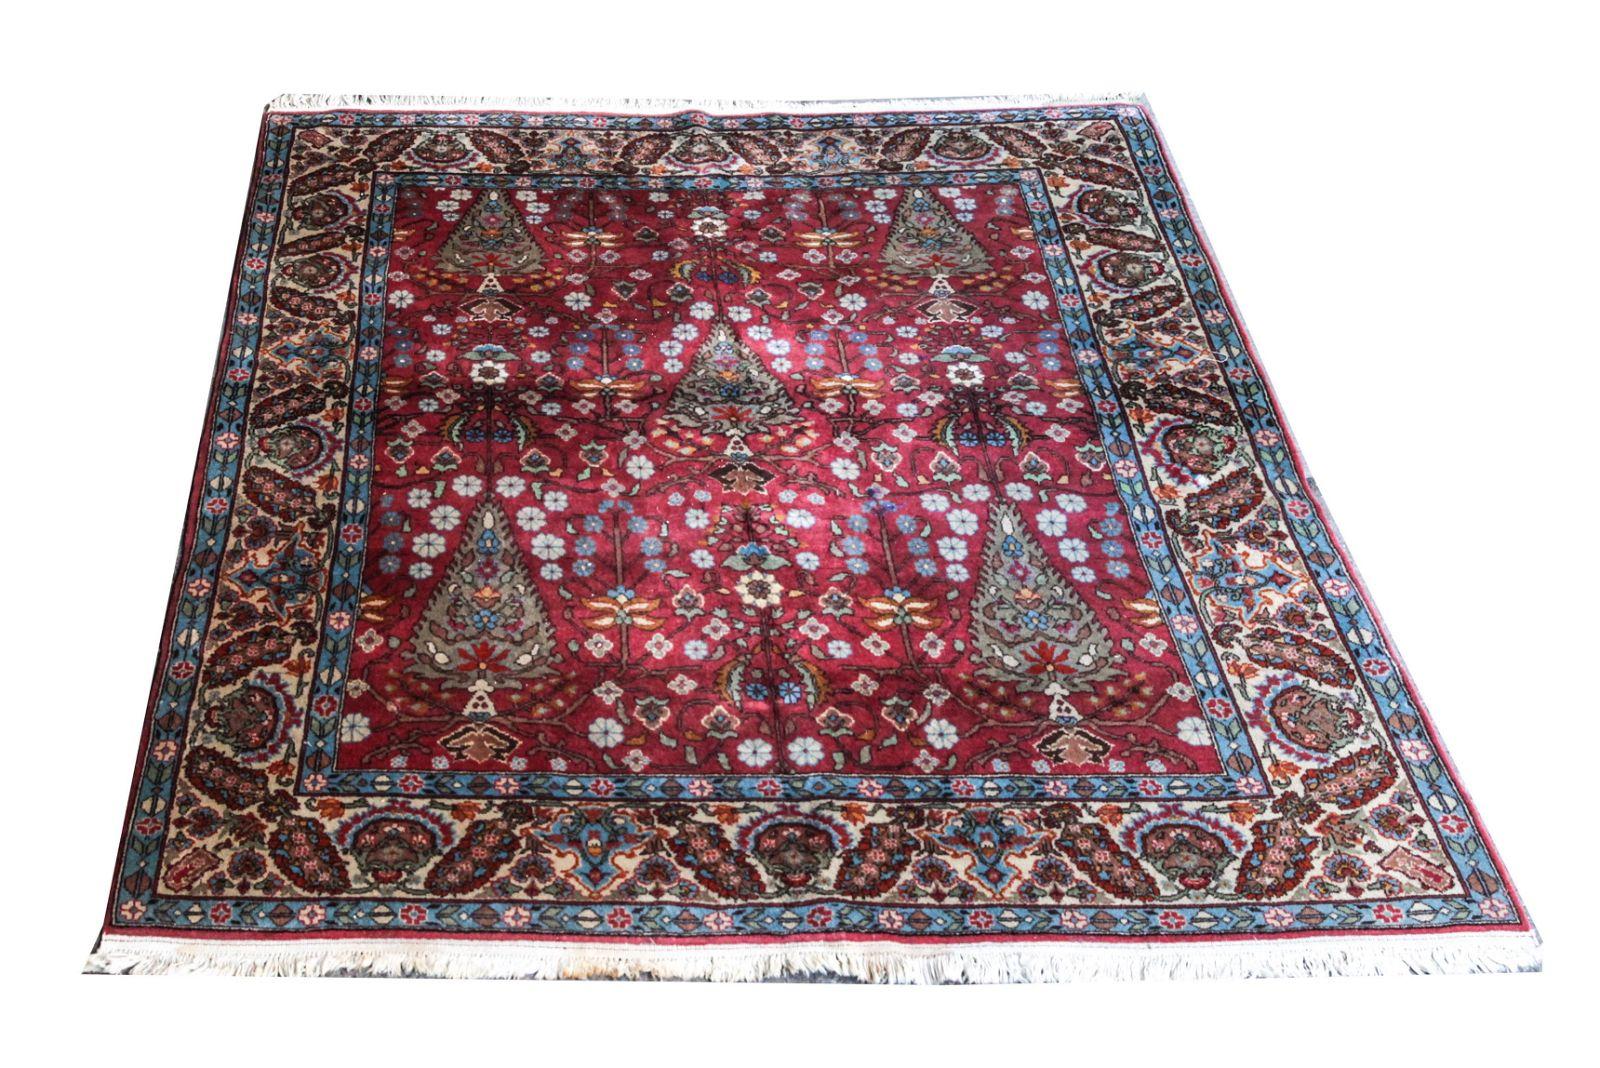 Persian Floral Rug 7' x 7'